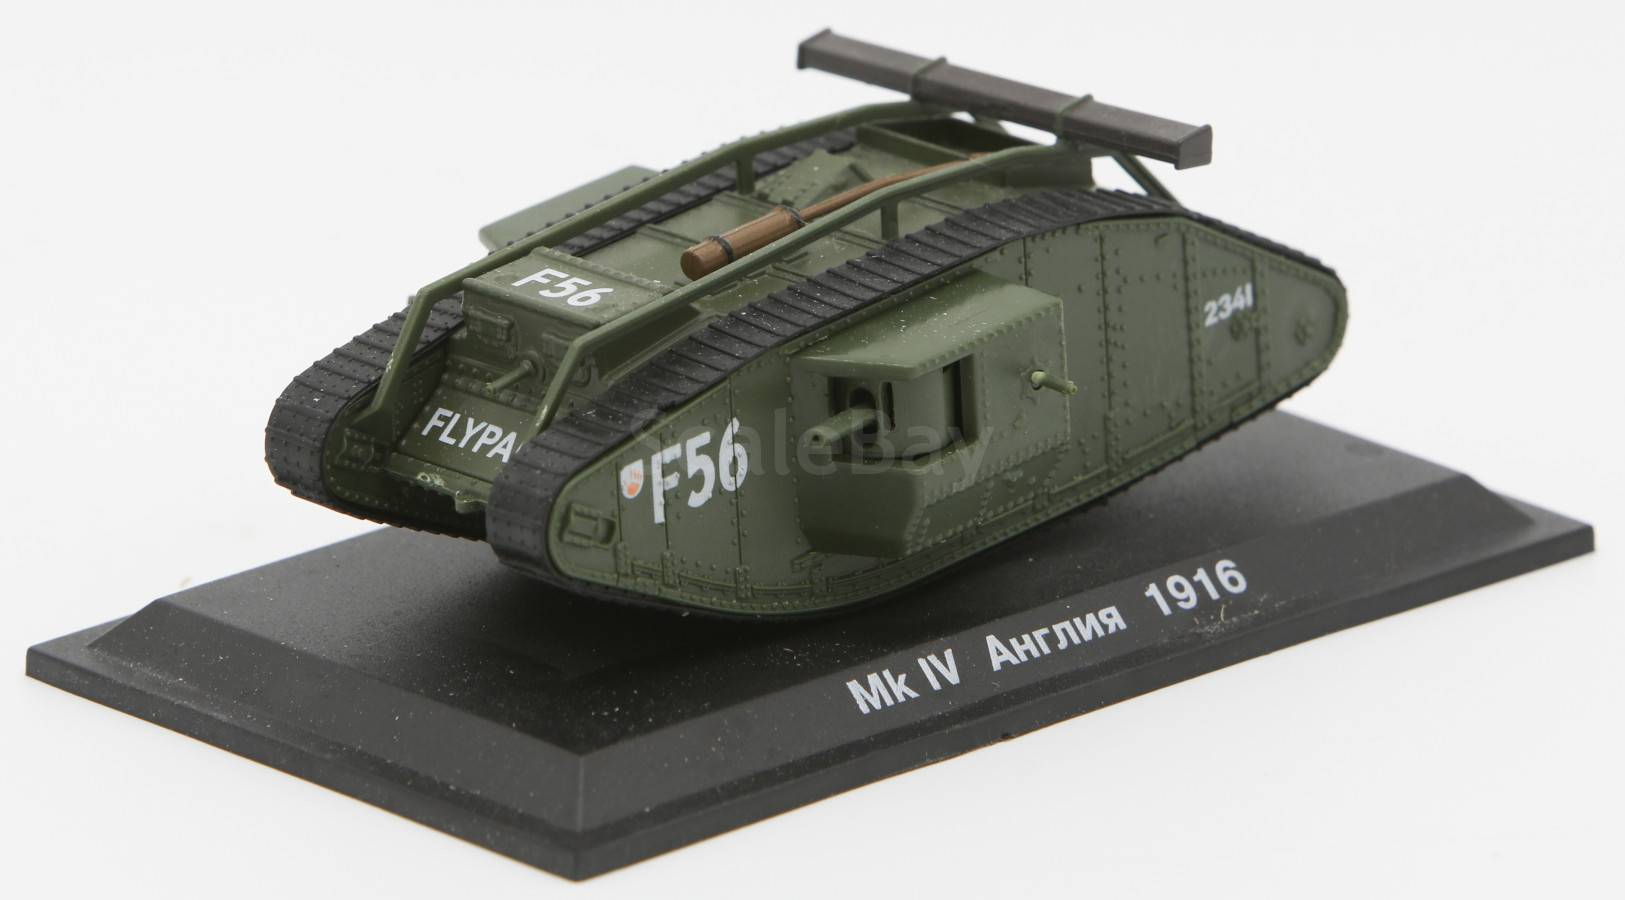 1//72 Captured Mark Mk IV Male British Heavy Tank WWI 1916 Diecast Model New